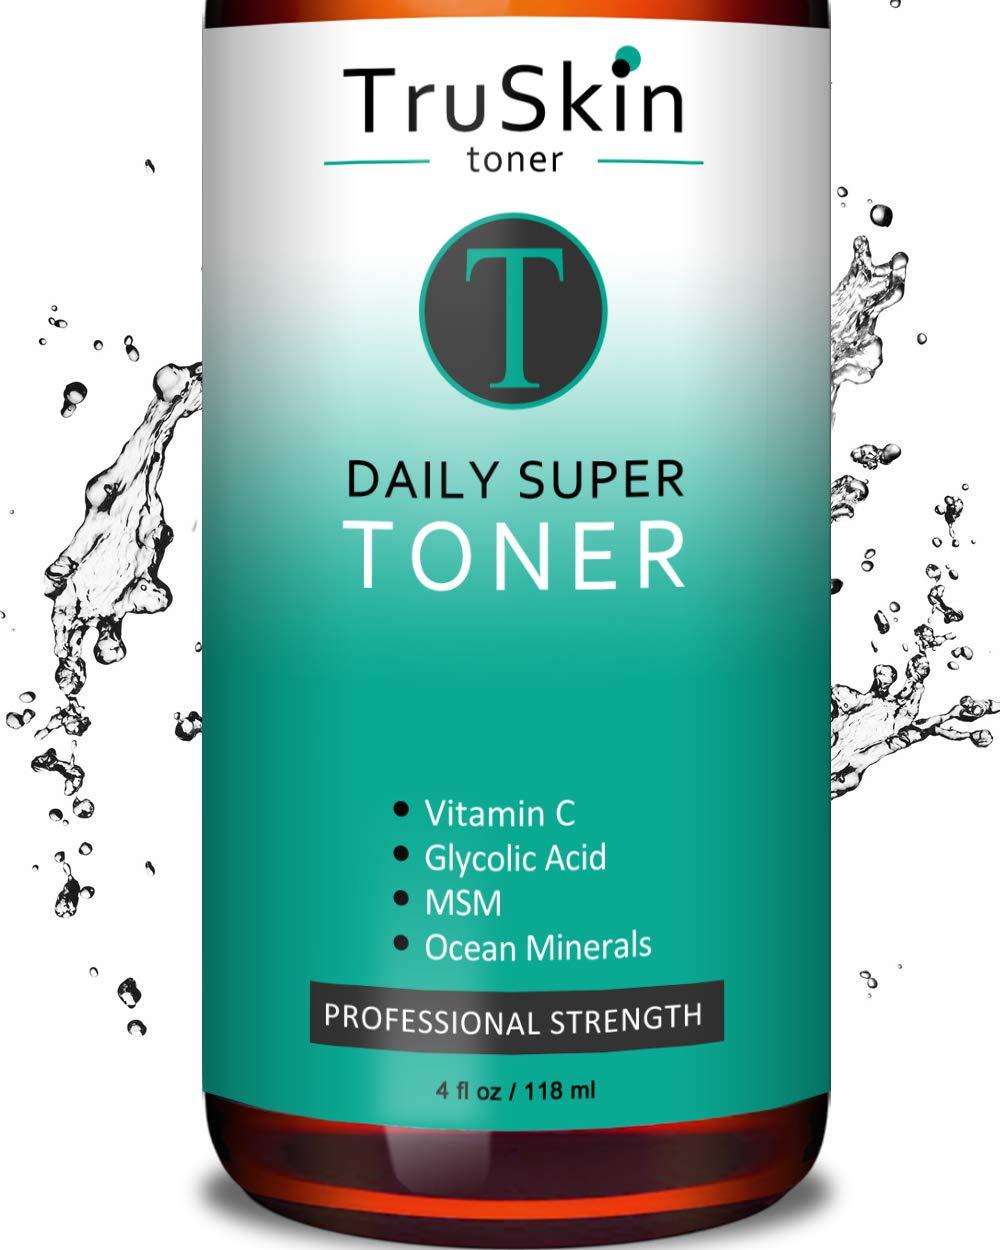 TruSkin Naturals DAILY Facial SUPER Toner